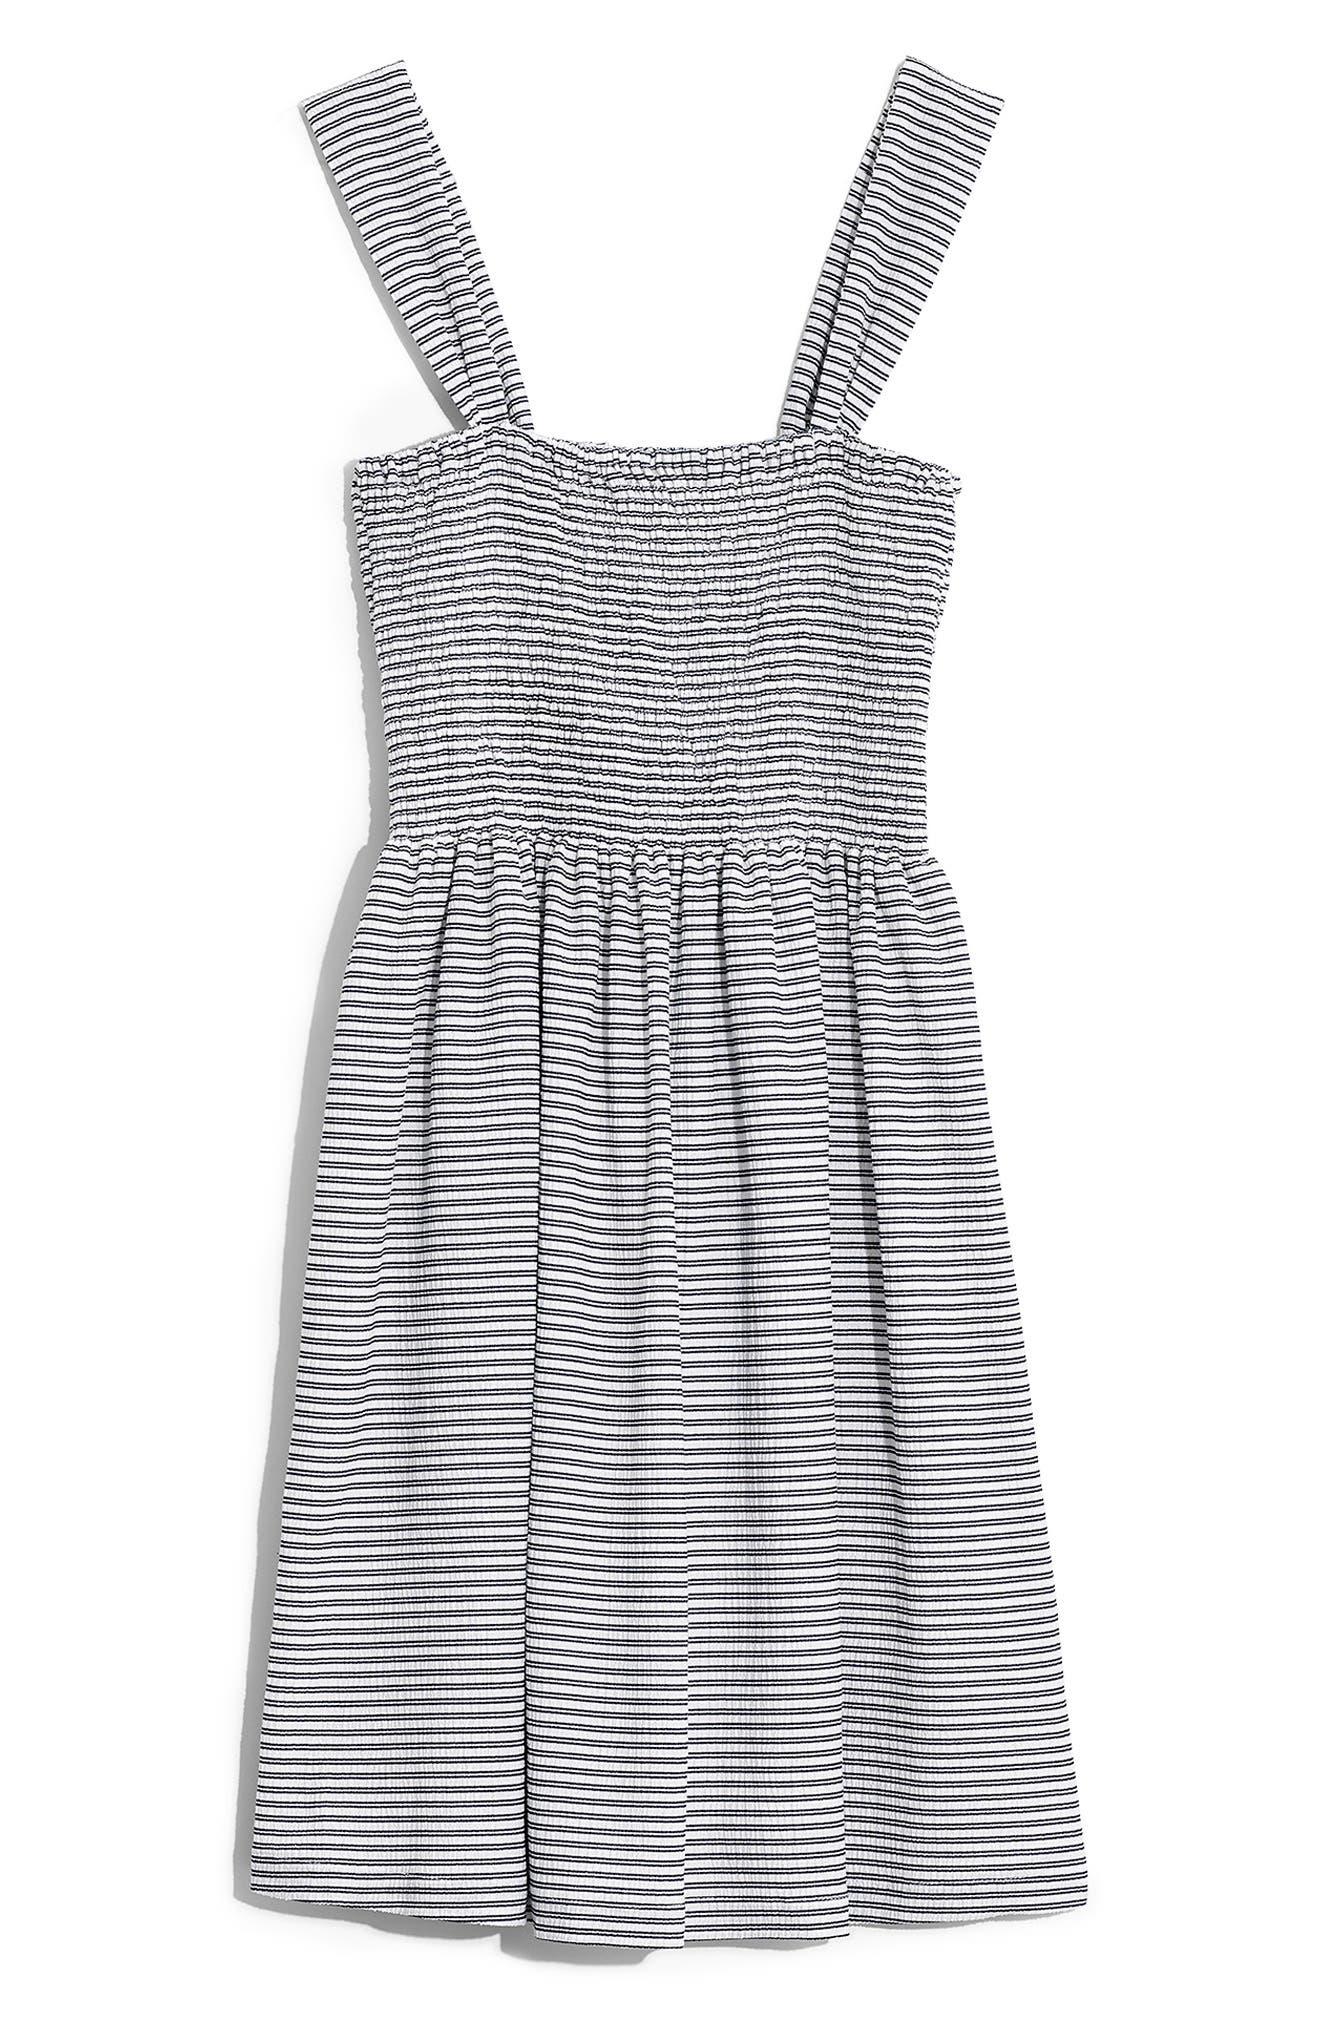 Madewell Texture & Thread Stripe Smocked Dress, Blue